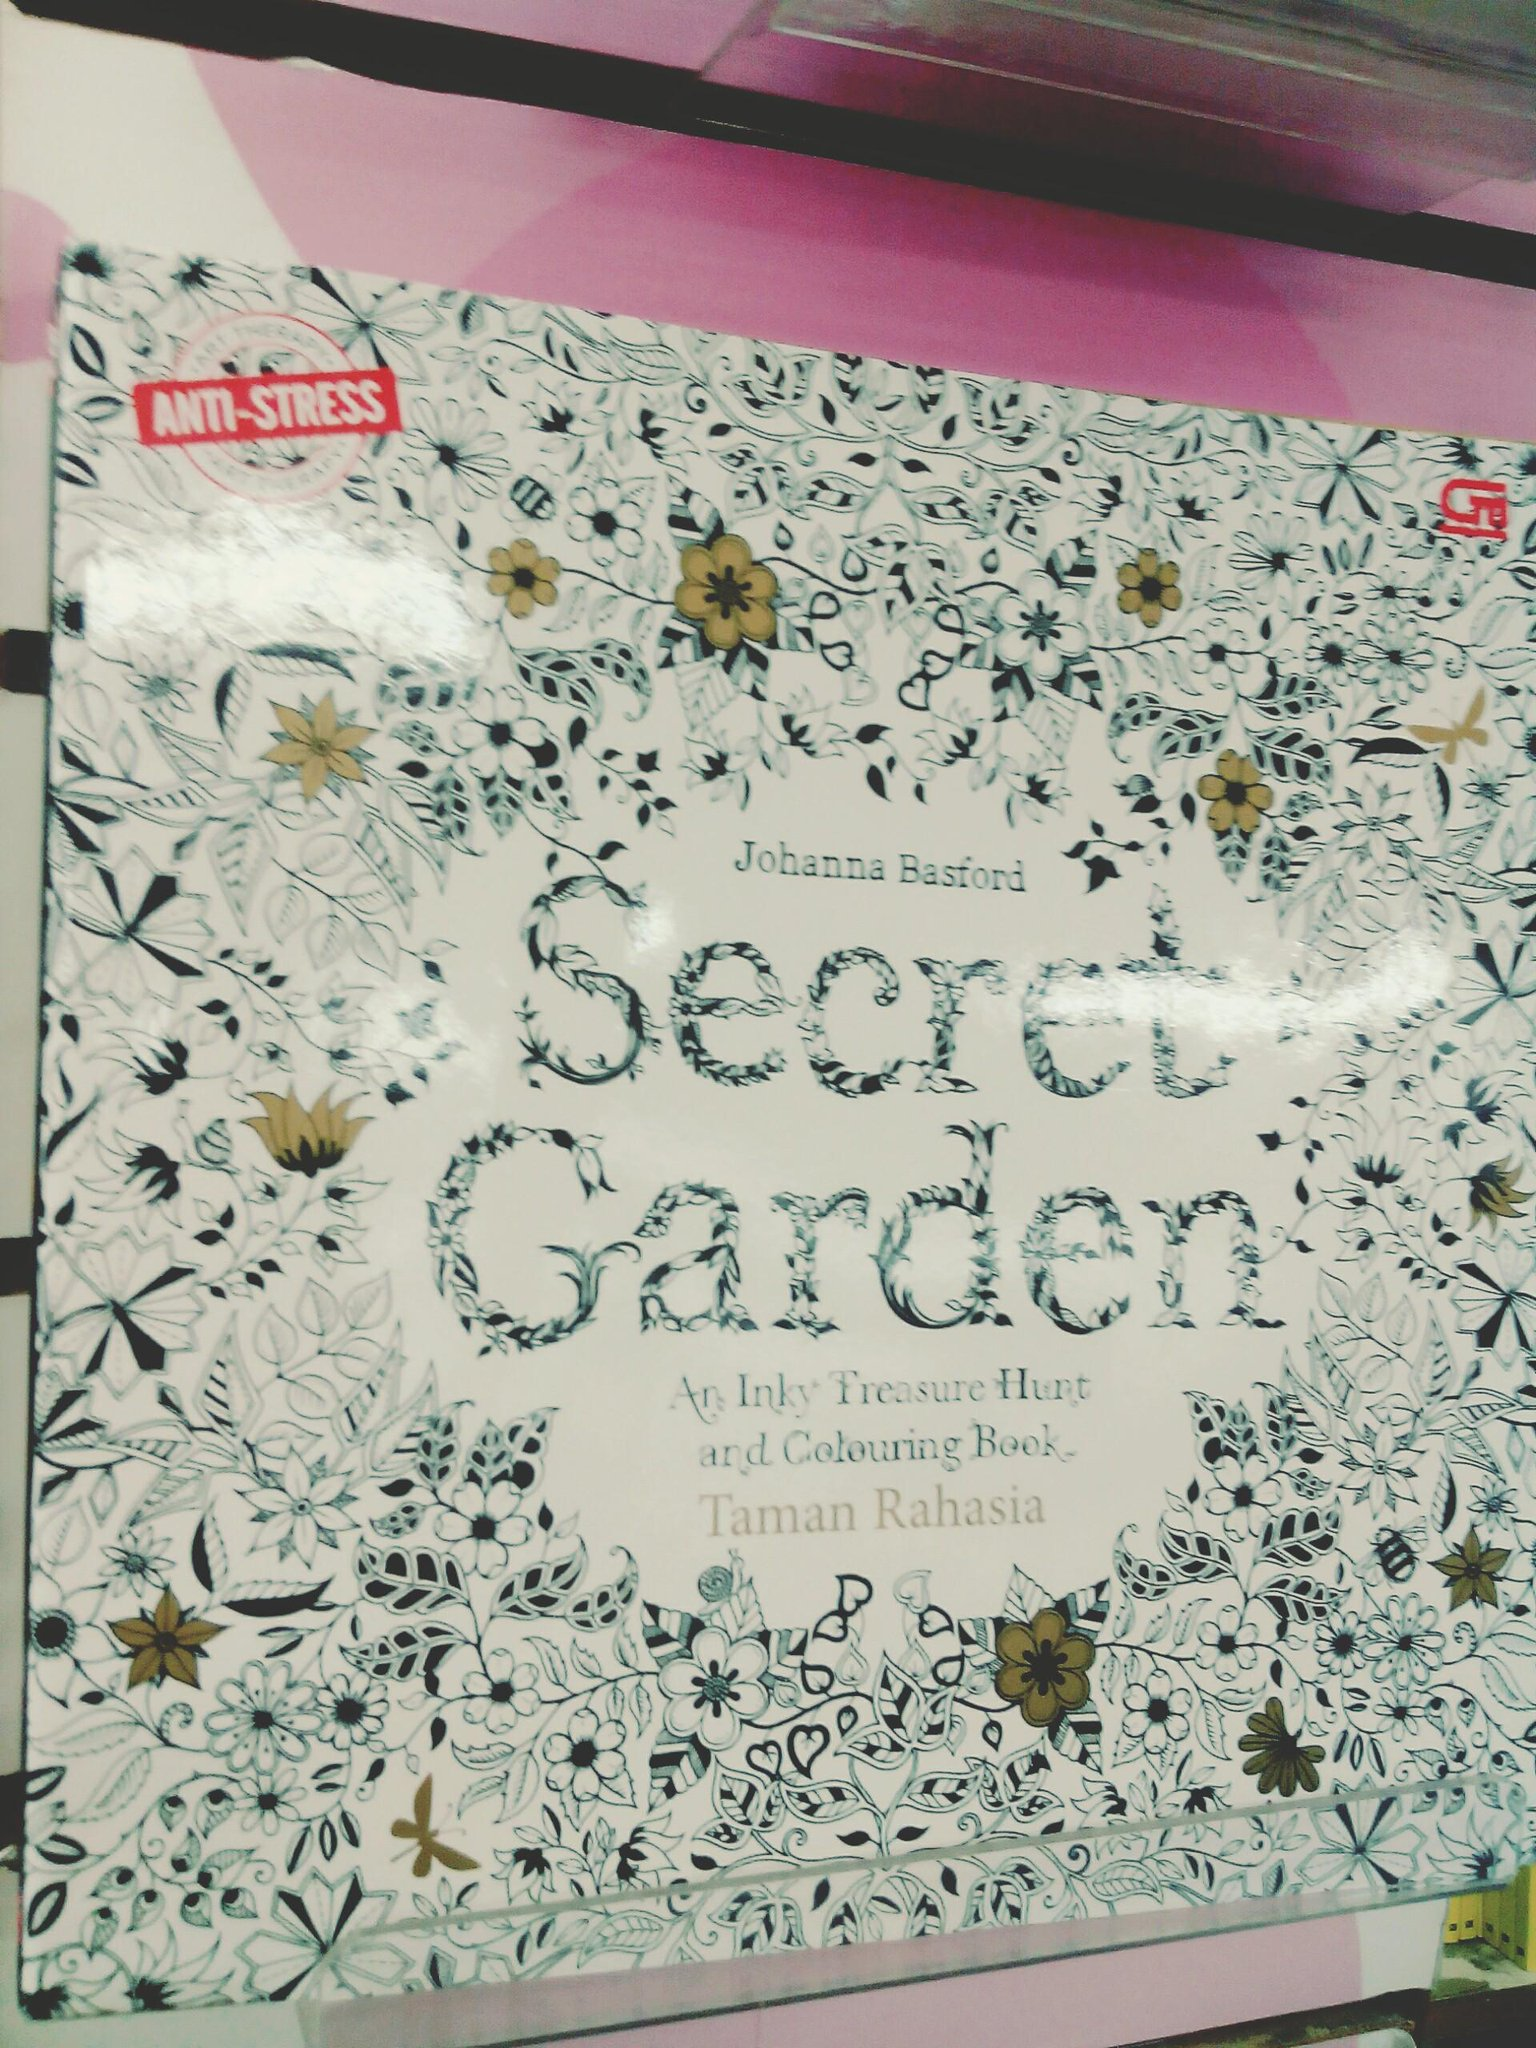 Gramedia Samarinda On Twitter Coloring Book SECRET GARDEN An Inky Treasure Hunt And Colouring Tco U1i5vlZpDE